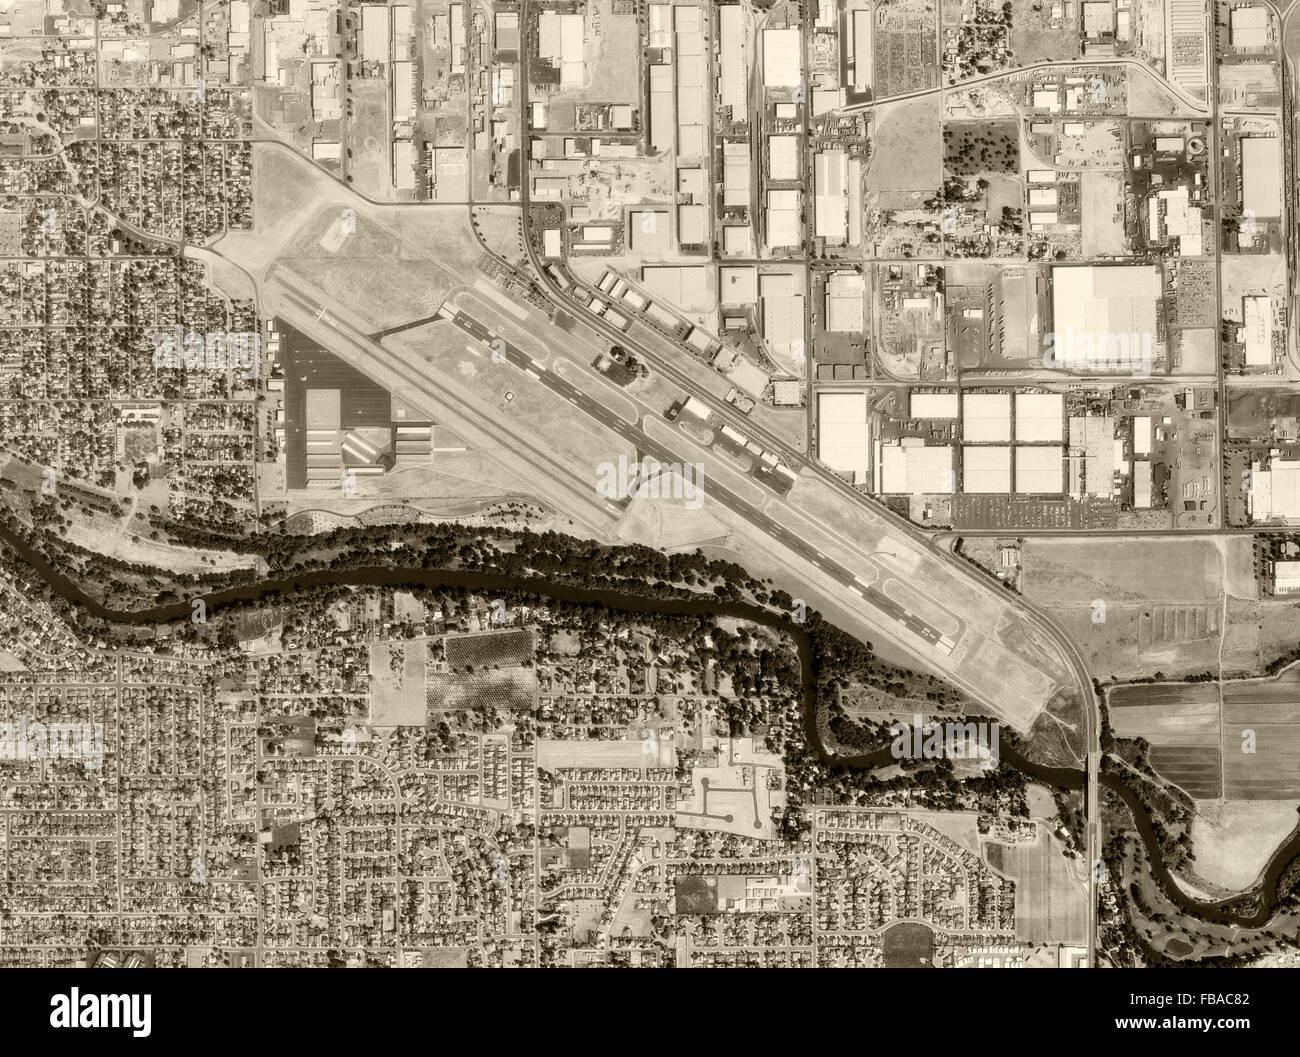 historical aerial photograph Modesto City–County Airport, Modesto, Stanislaus County, California, 1998 - Stock Image